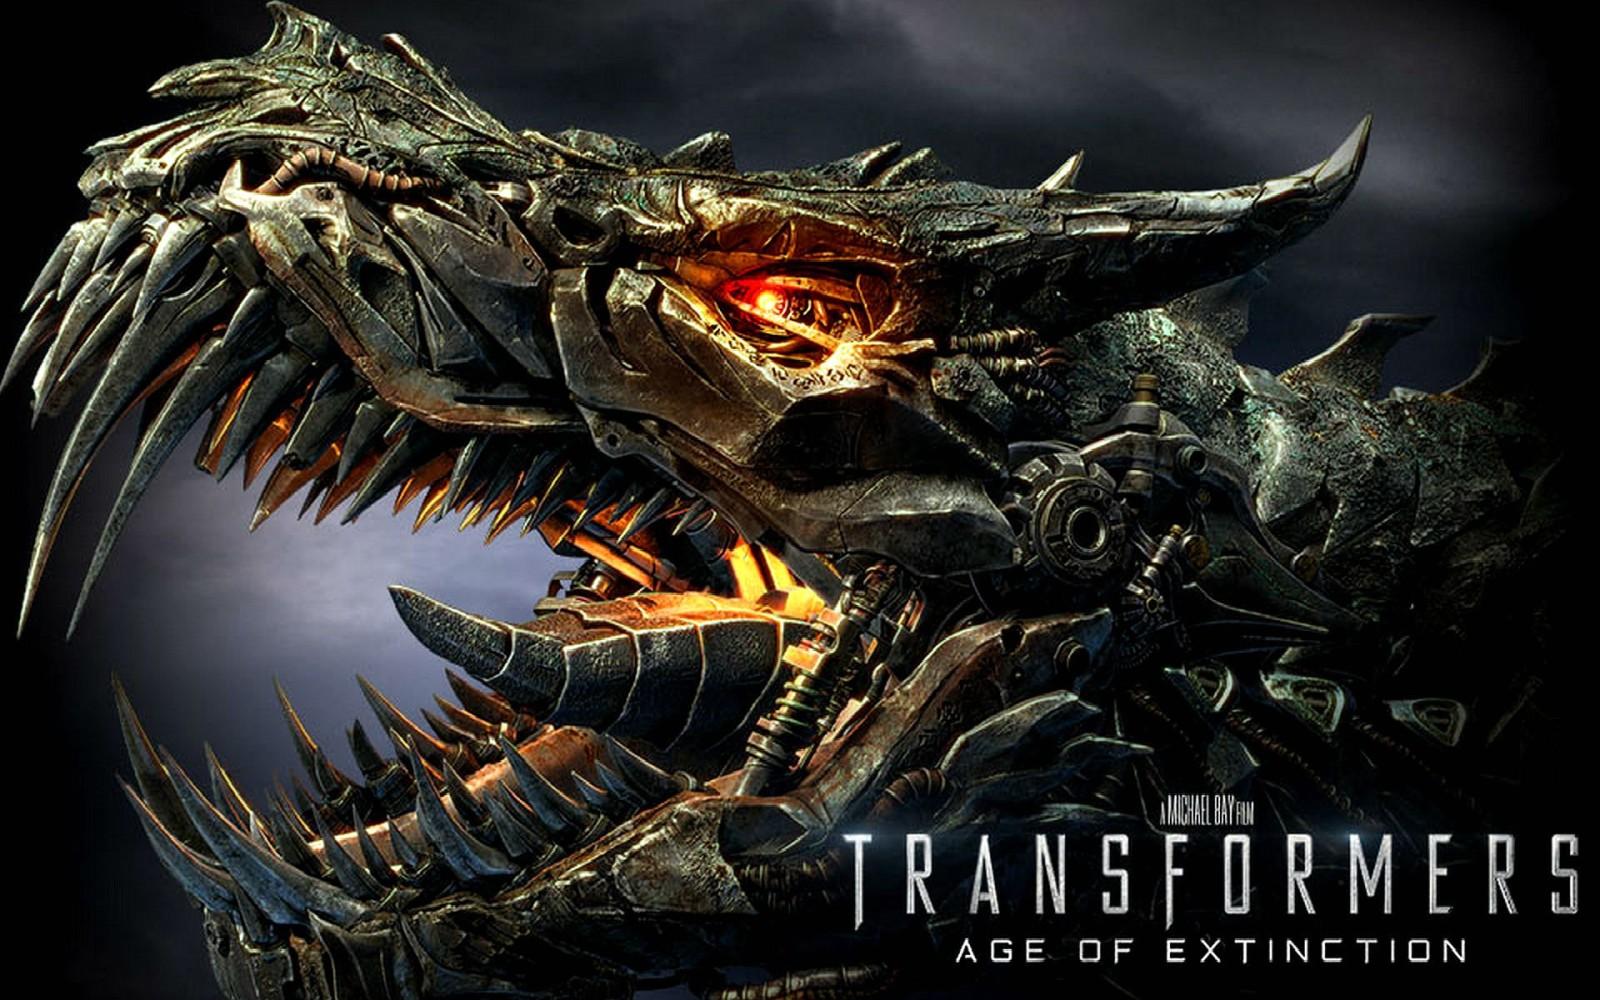 Transformers 4 Wallpaper Desktop Background On Wallpaper - Transformers 4 Dinobots Grimlock - HD Wallpaper